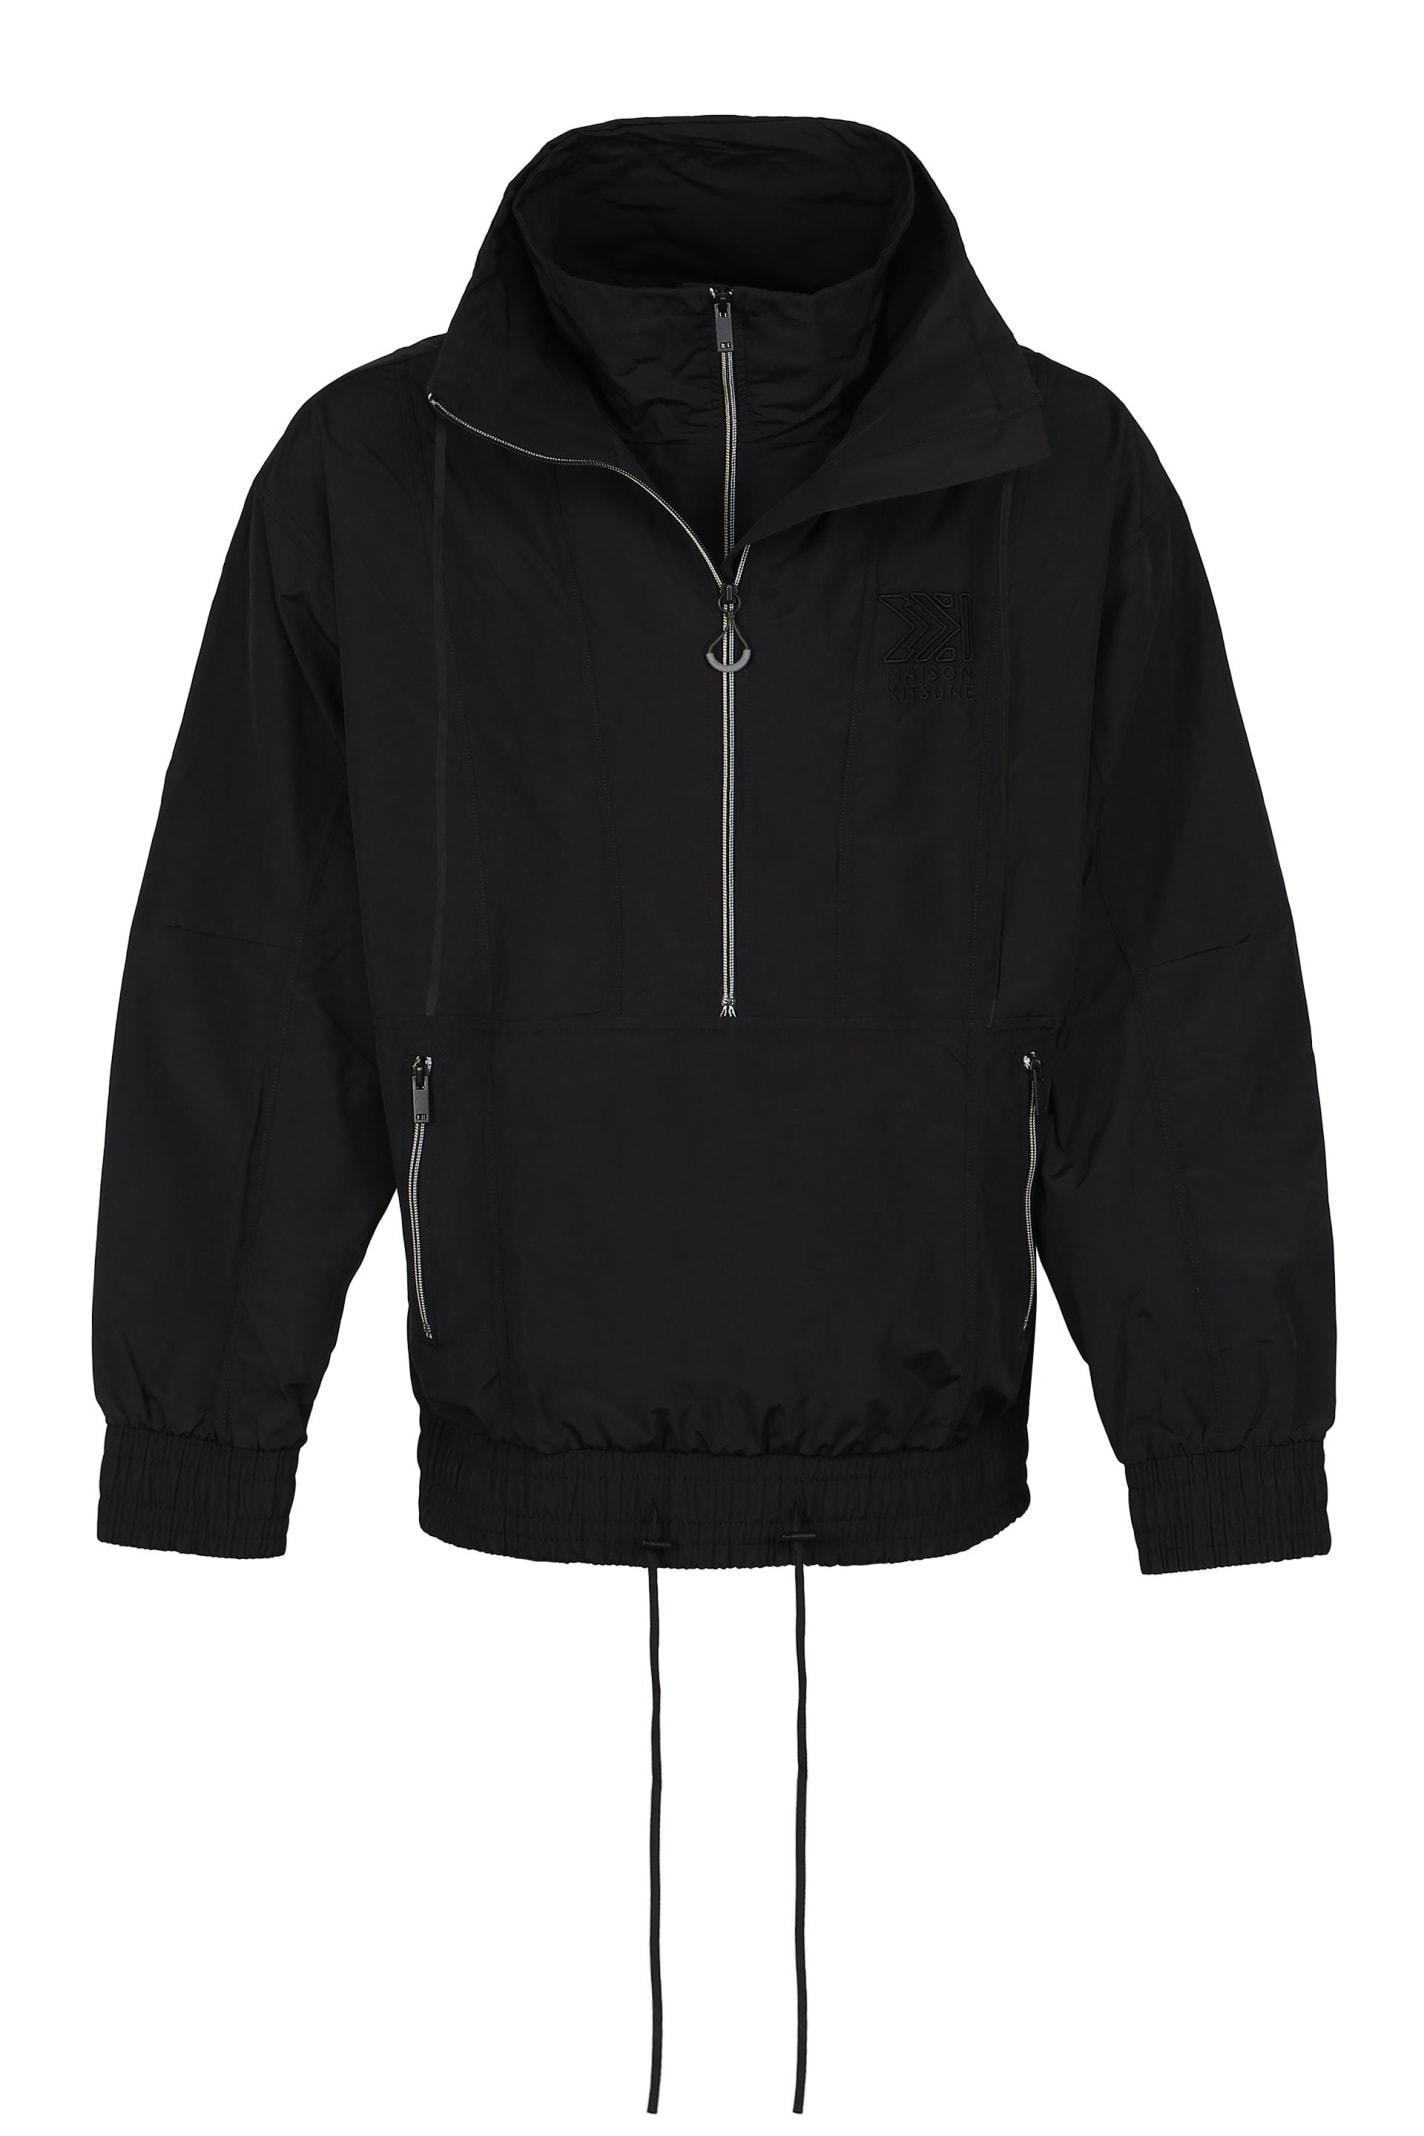 Maison Kitsuné Techno Fabric Jacket